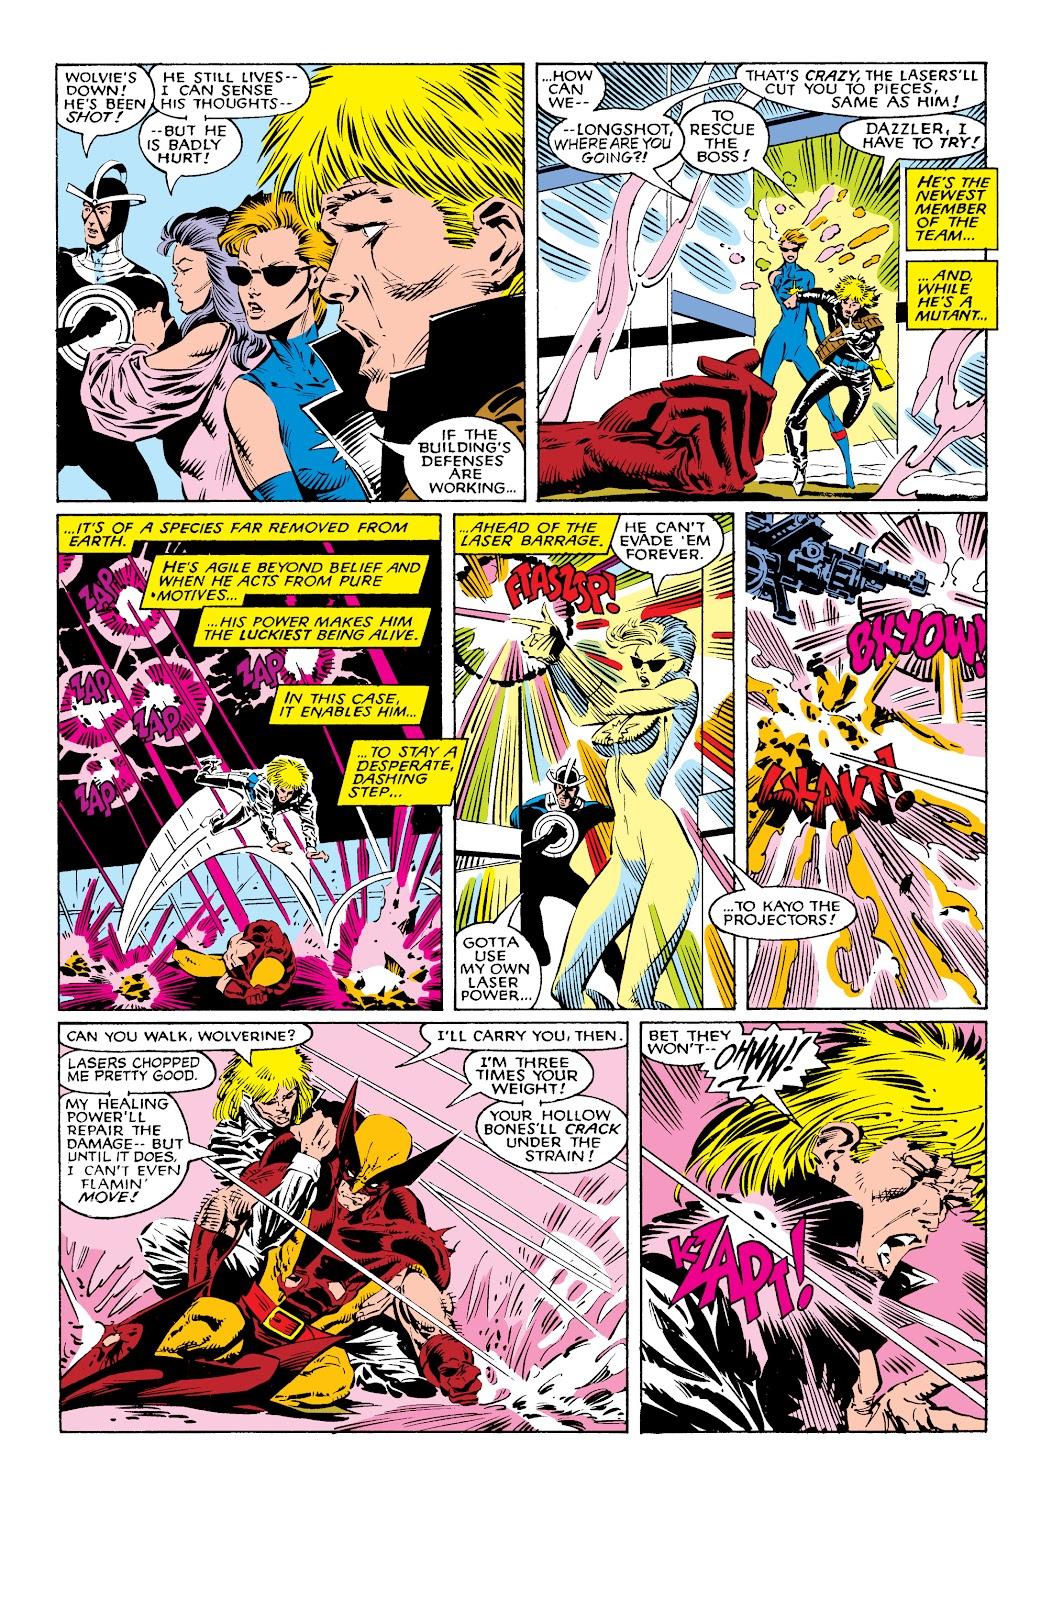 Read online X-Men Milestones: Fall of the Mutants comic -  Issue # TPB (Part 1) - 17